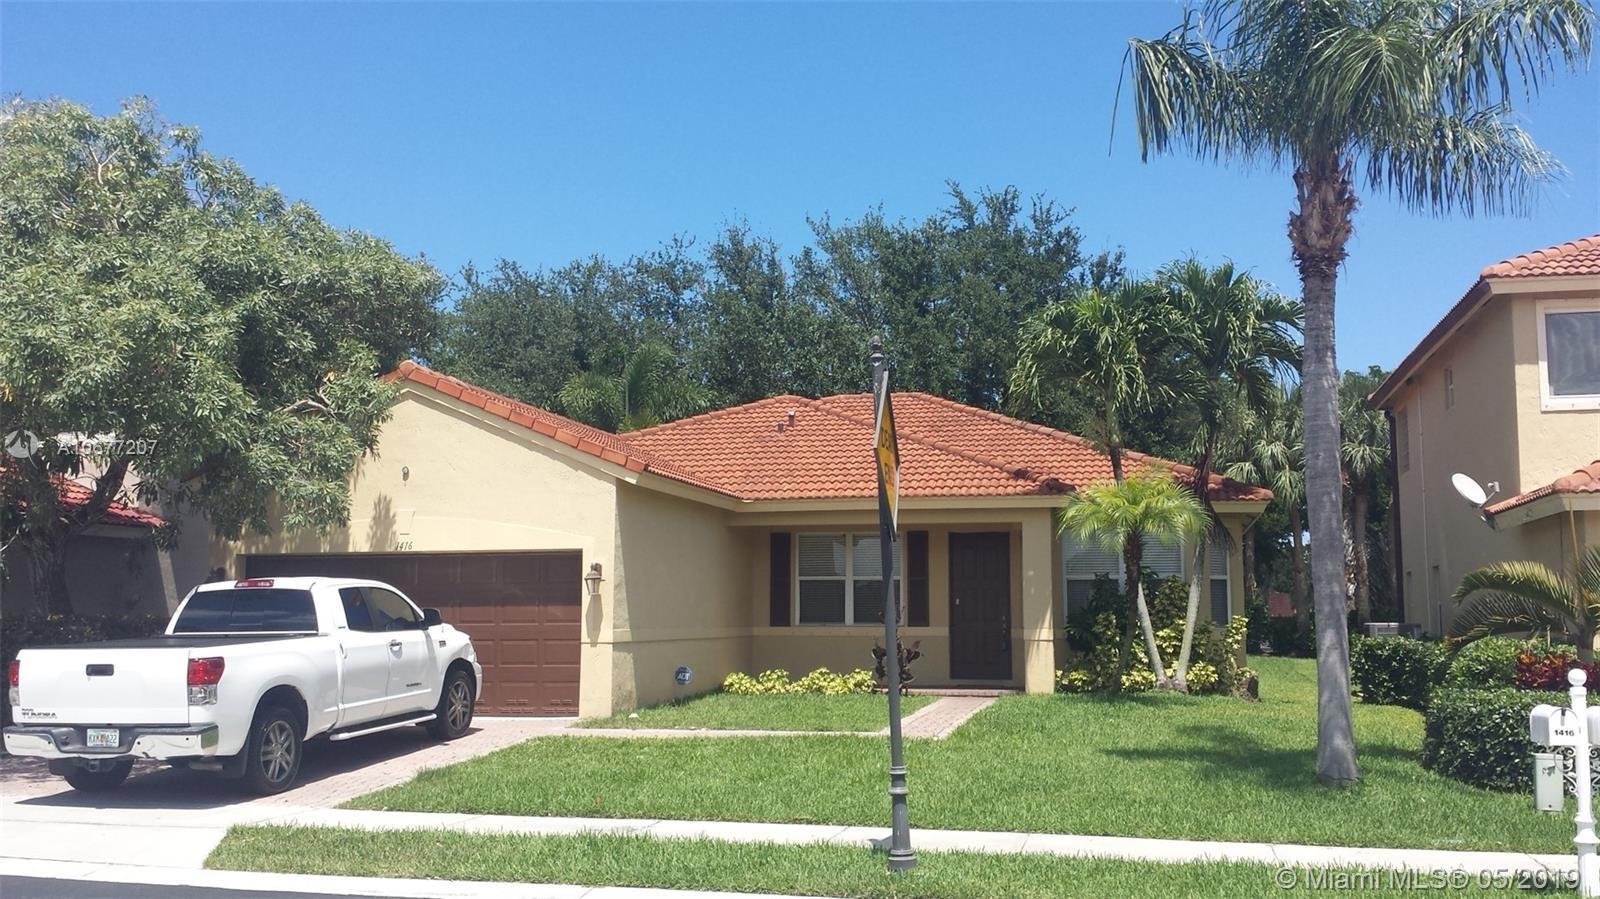 1416 Magliano Dr Boynton Beach, FL 33436